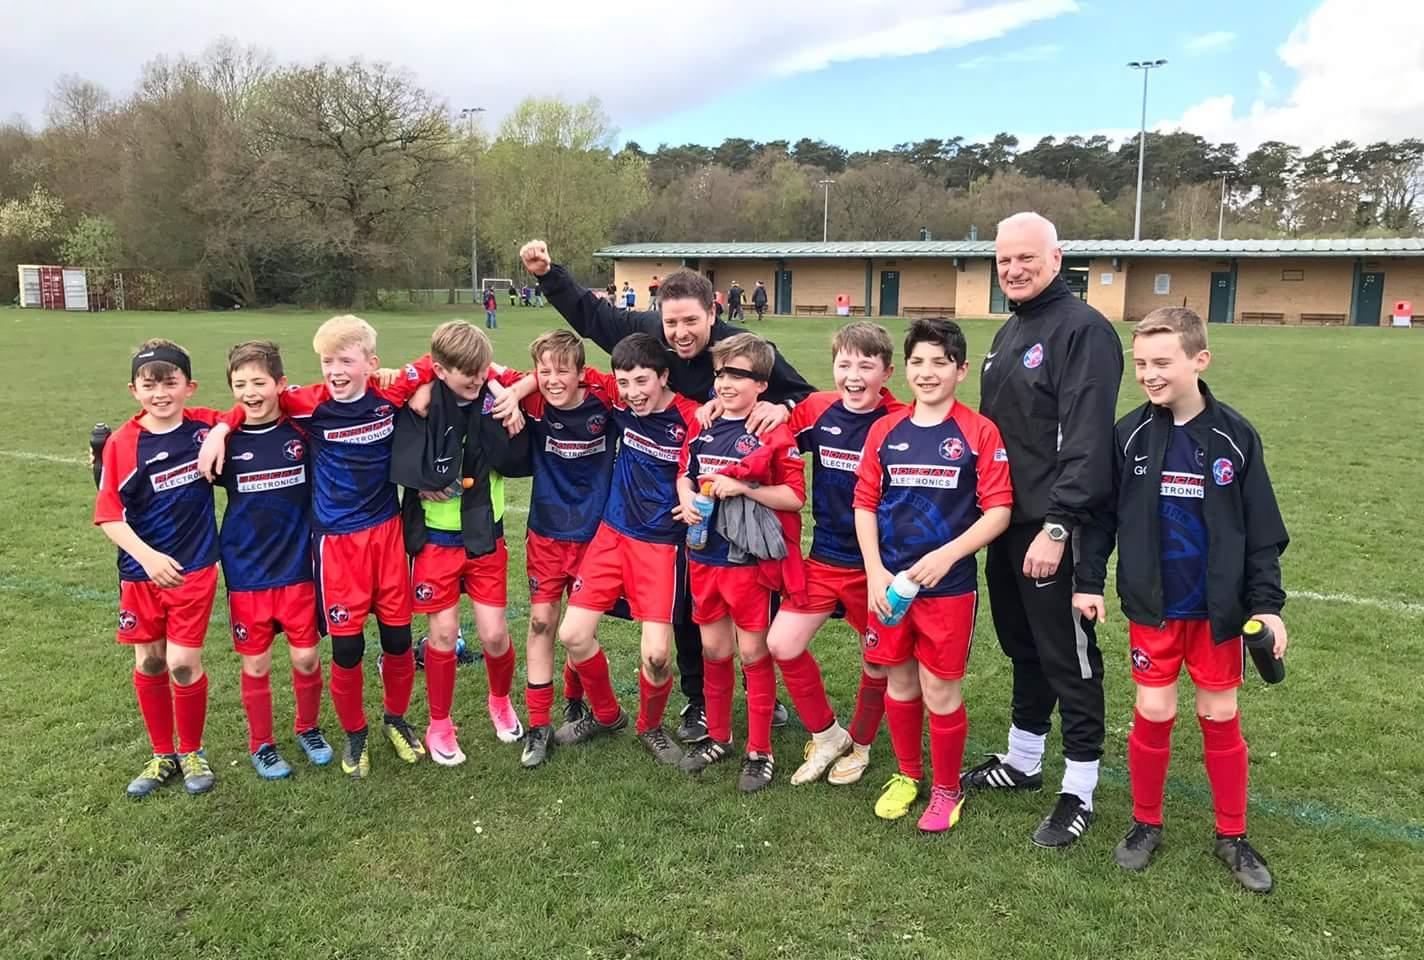 U12 Galaxy Division 4 Champions